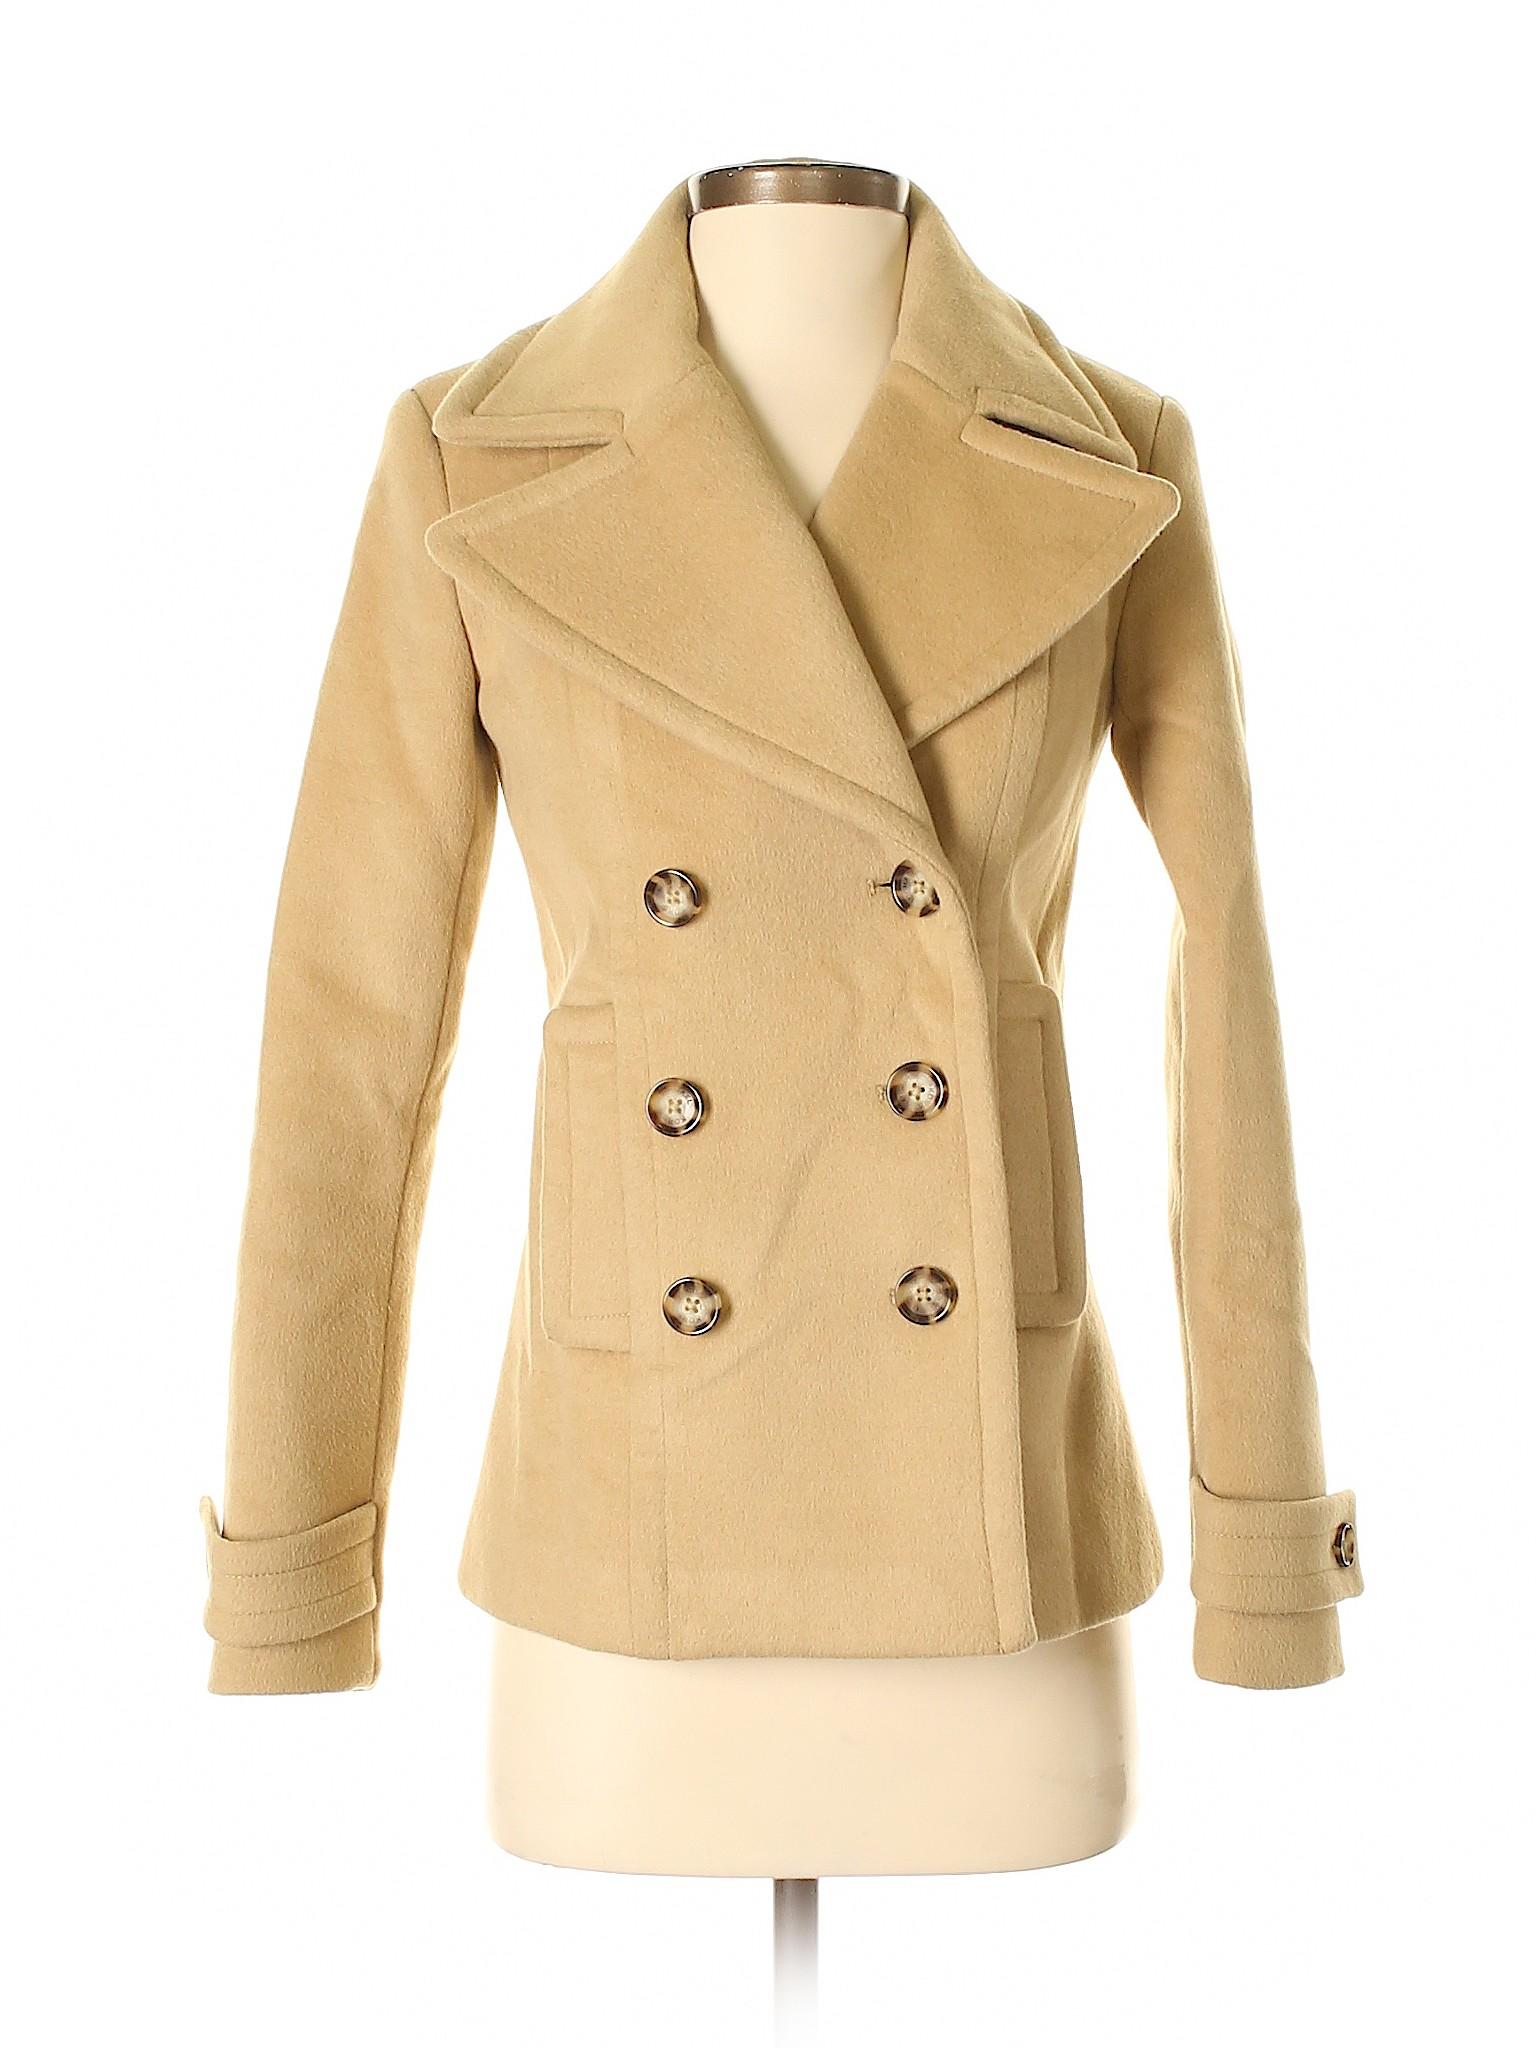 558c39e6f9be69 Nana Baila Women s Clothing On Sale Up To 90% Off Retail